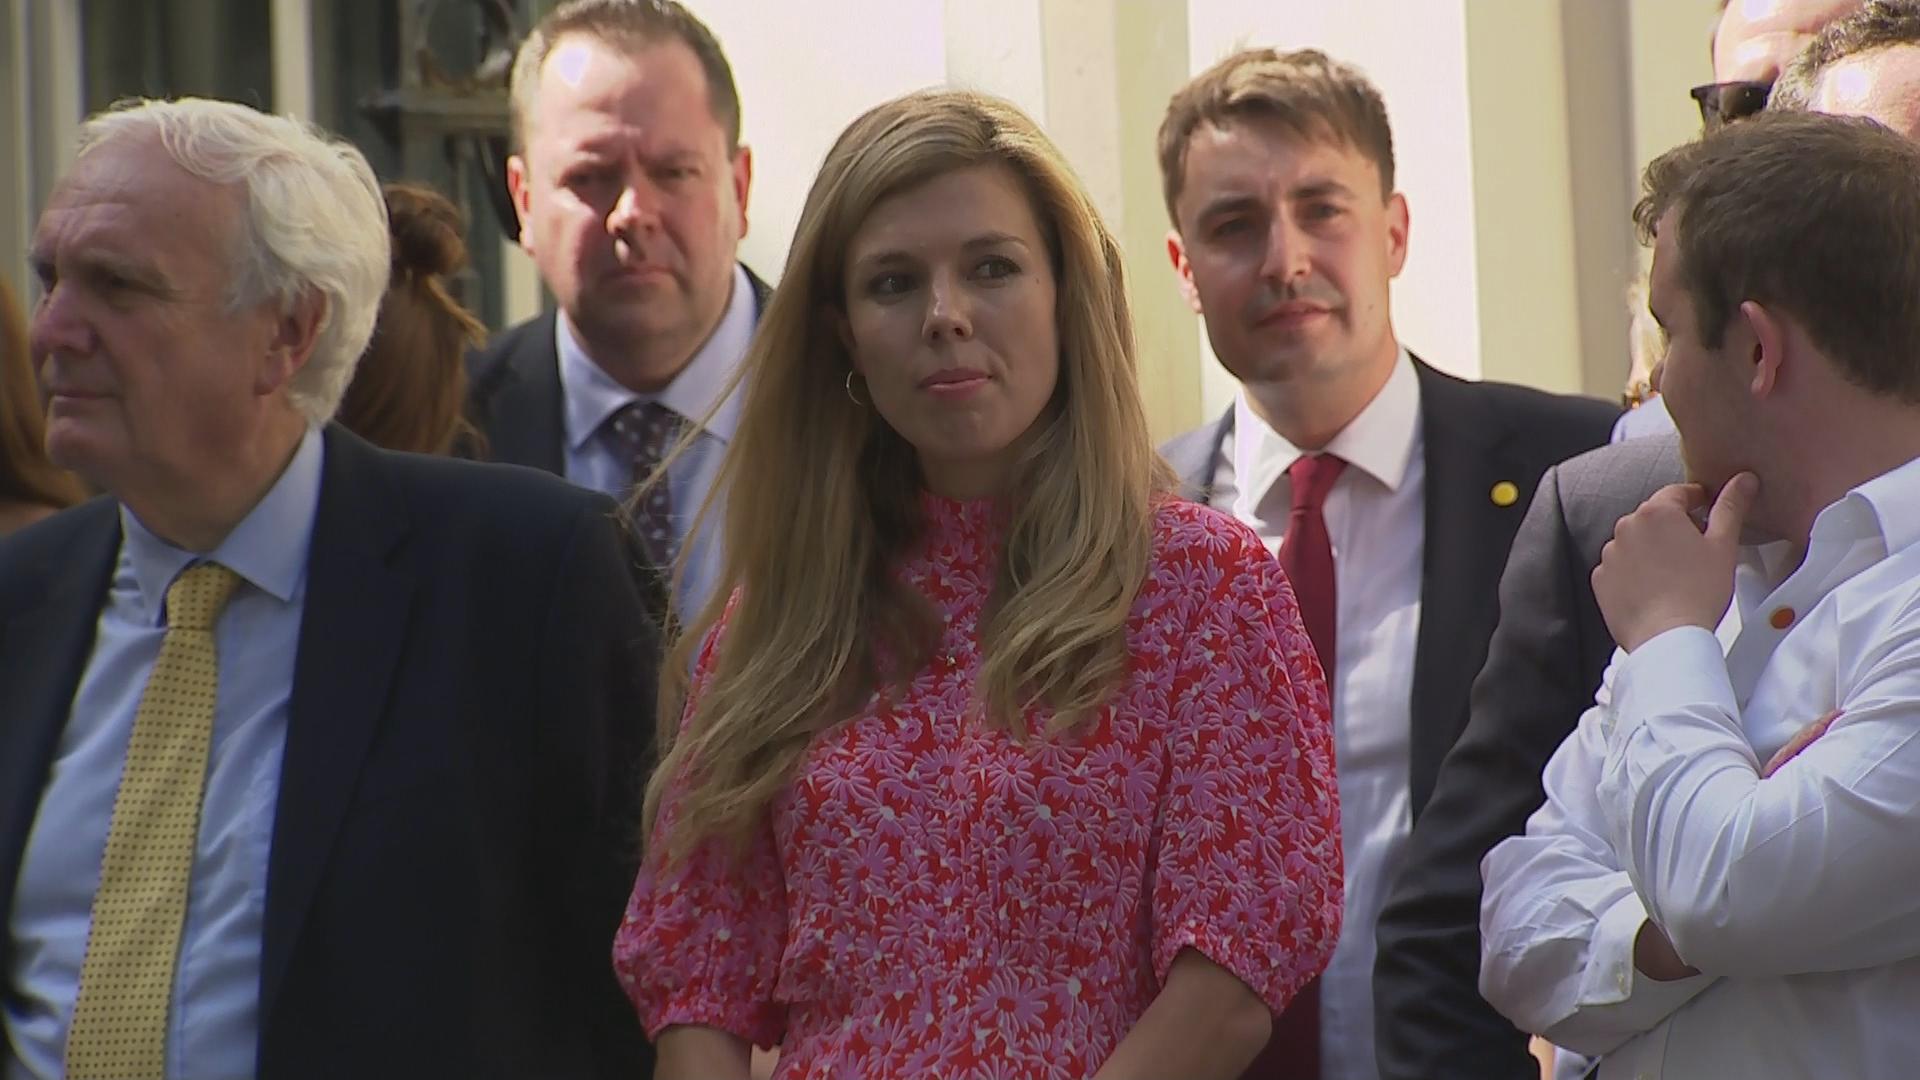 Boris Johnson's Partner Carrie Symonds WILL Move Into Downing Street